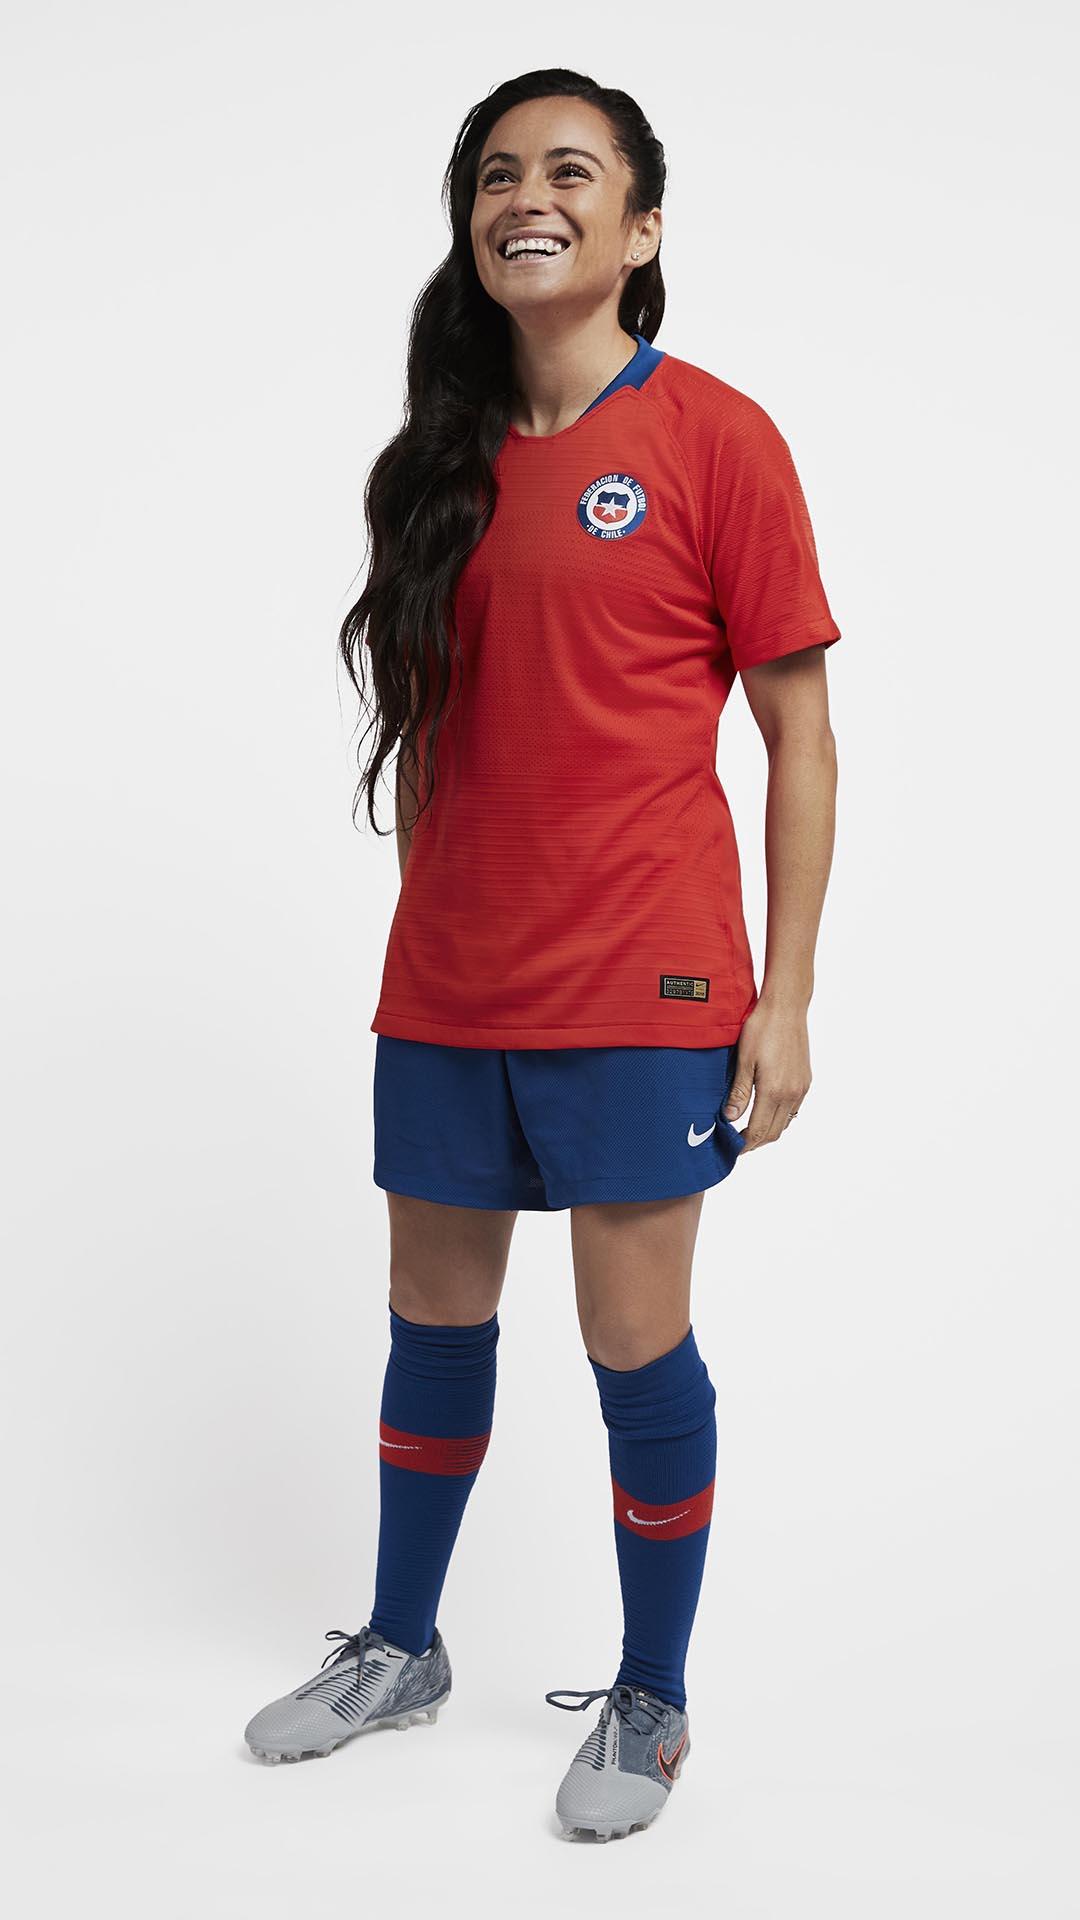 maillot-domicile-chili-coupe-du-monde-feminine-2019-nike